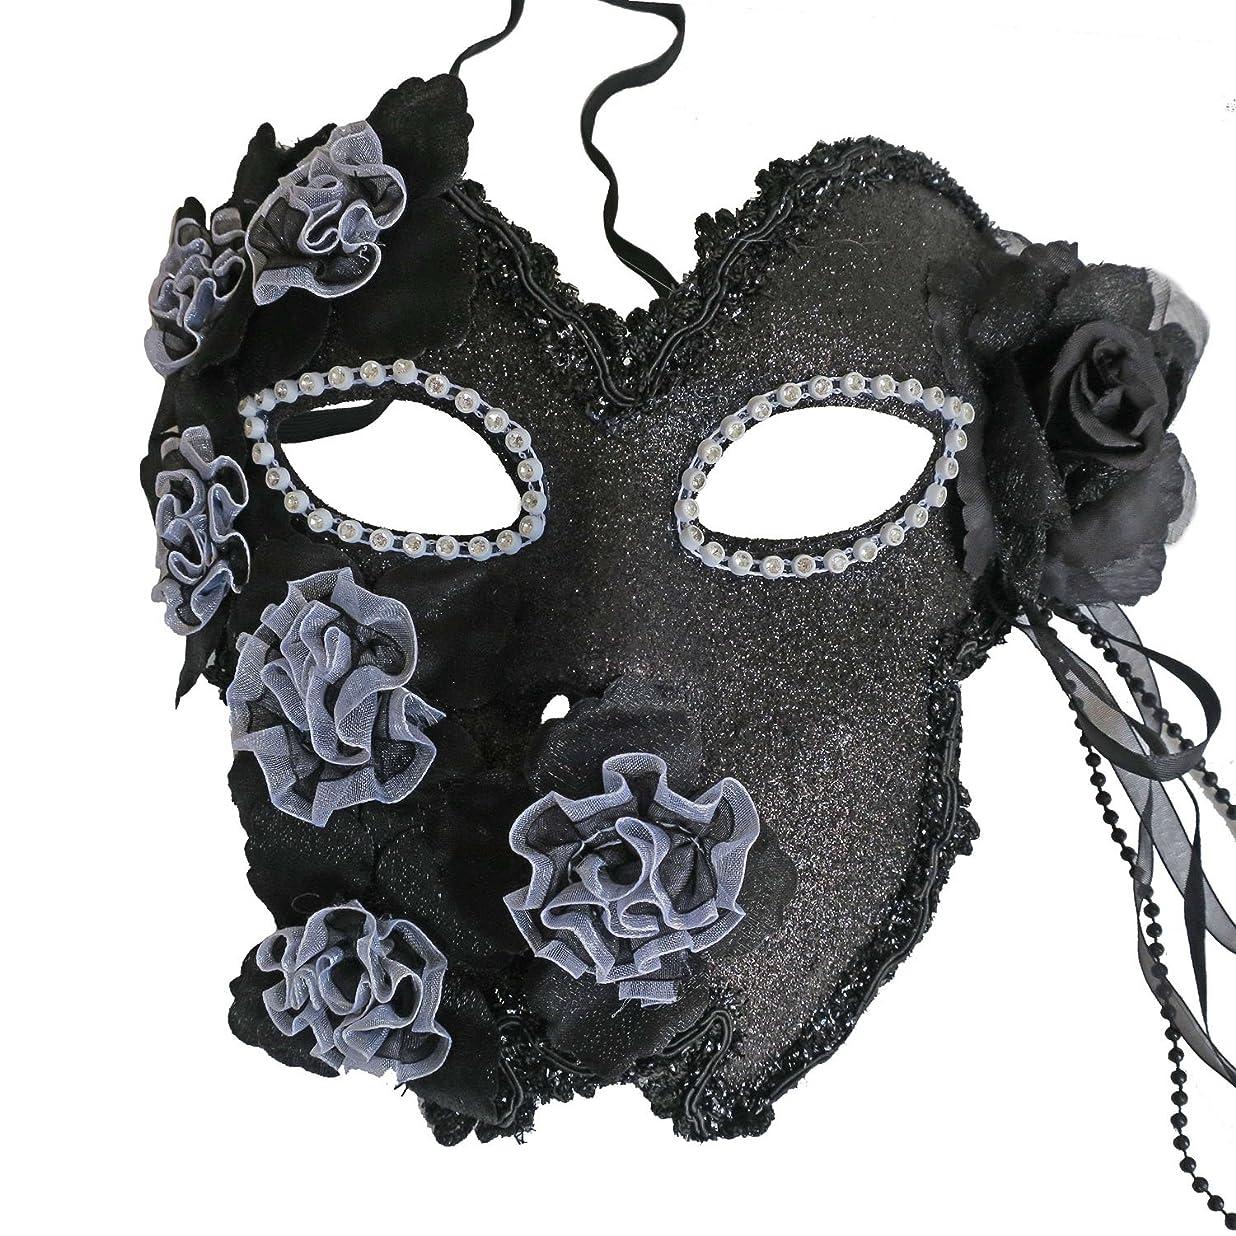 ZjpMask Flower Venetian Masquerade Full Face Lace Women Eye Mask for Costume Mardi Gras, Wall Decorative Art ddsyjwah2